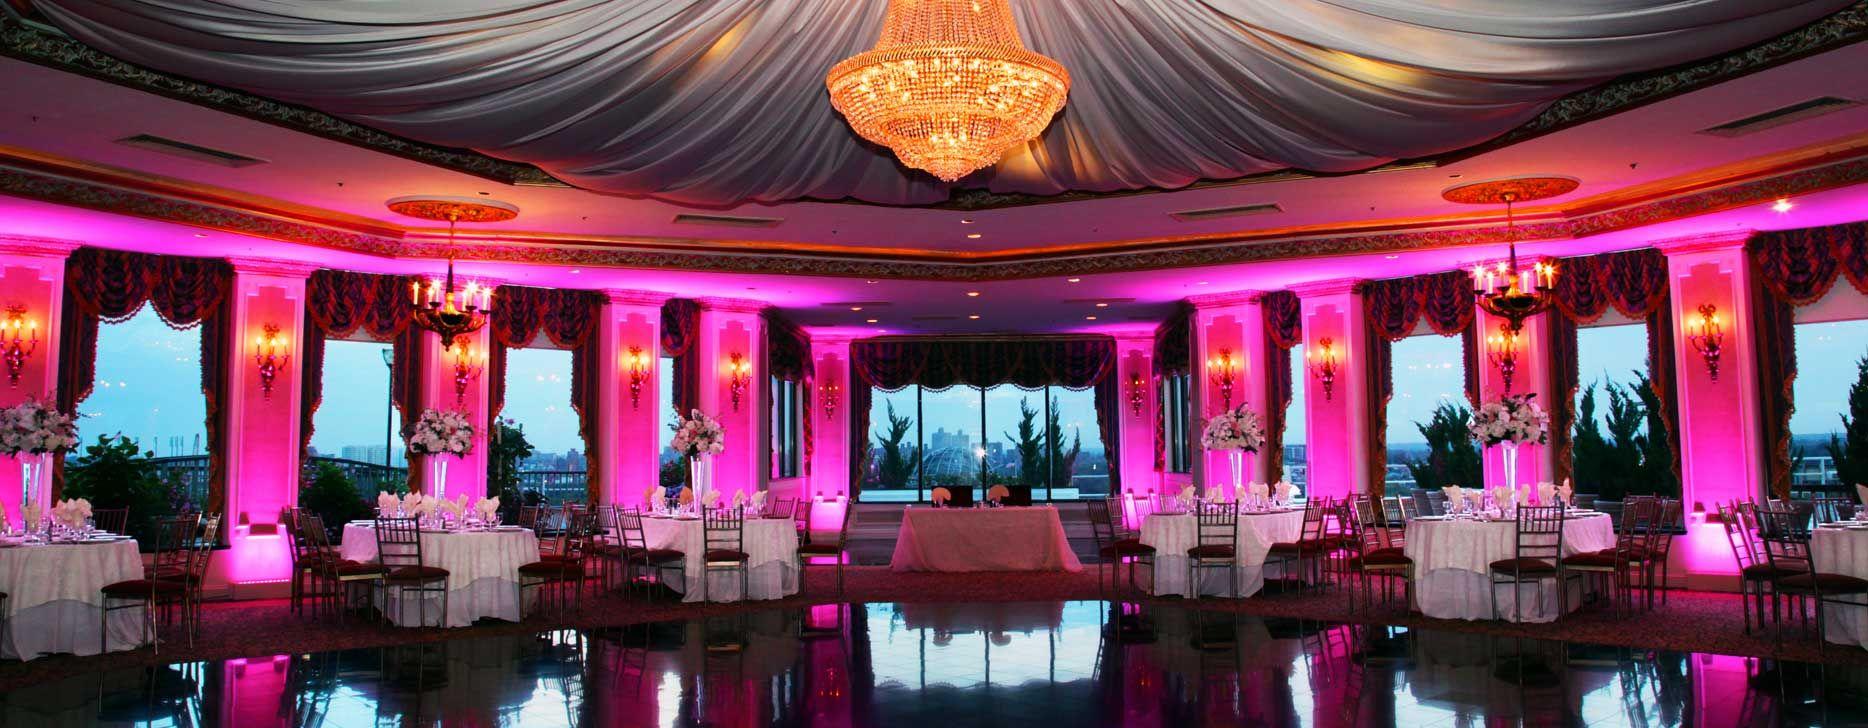 Rooftop Penthouse Indian Wedding Venue Wedding Venues Ny Wedding Venues